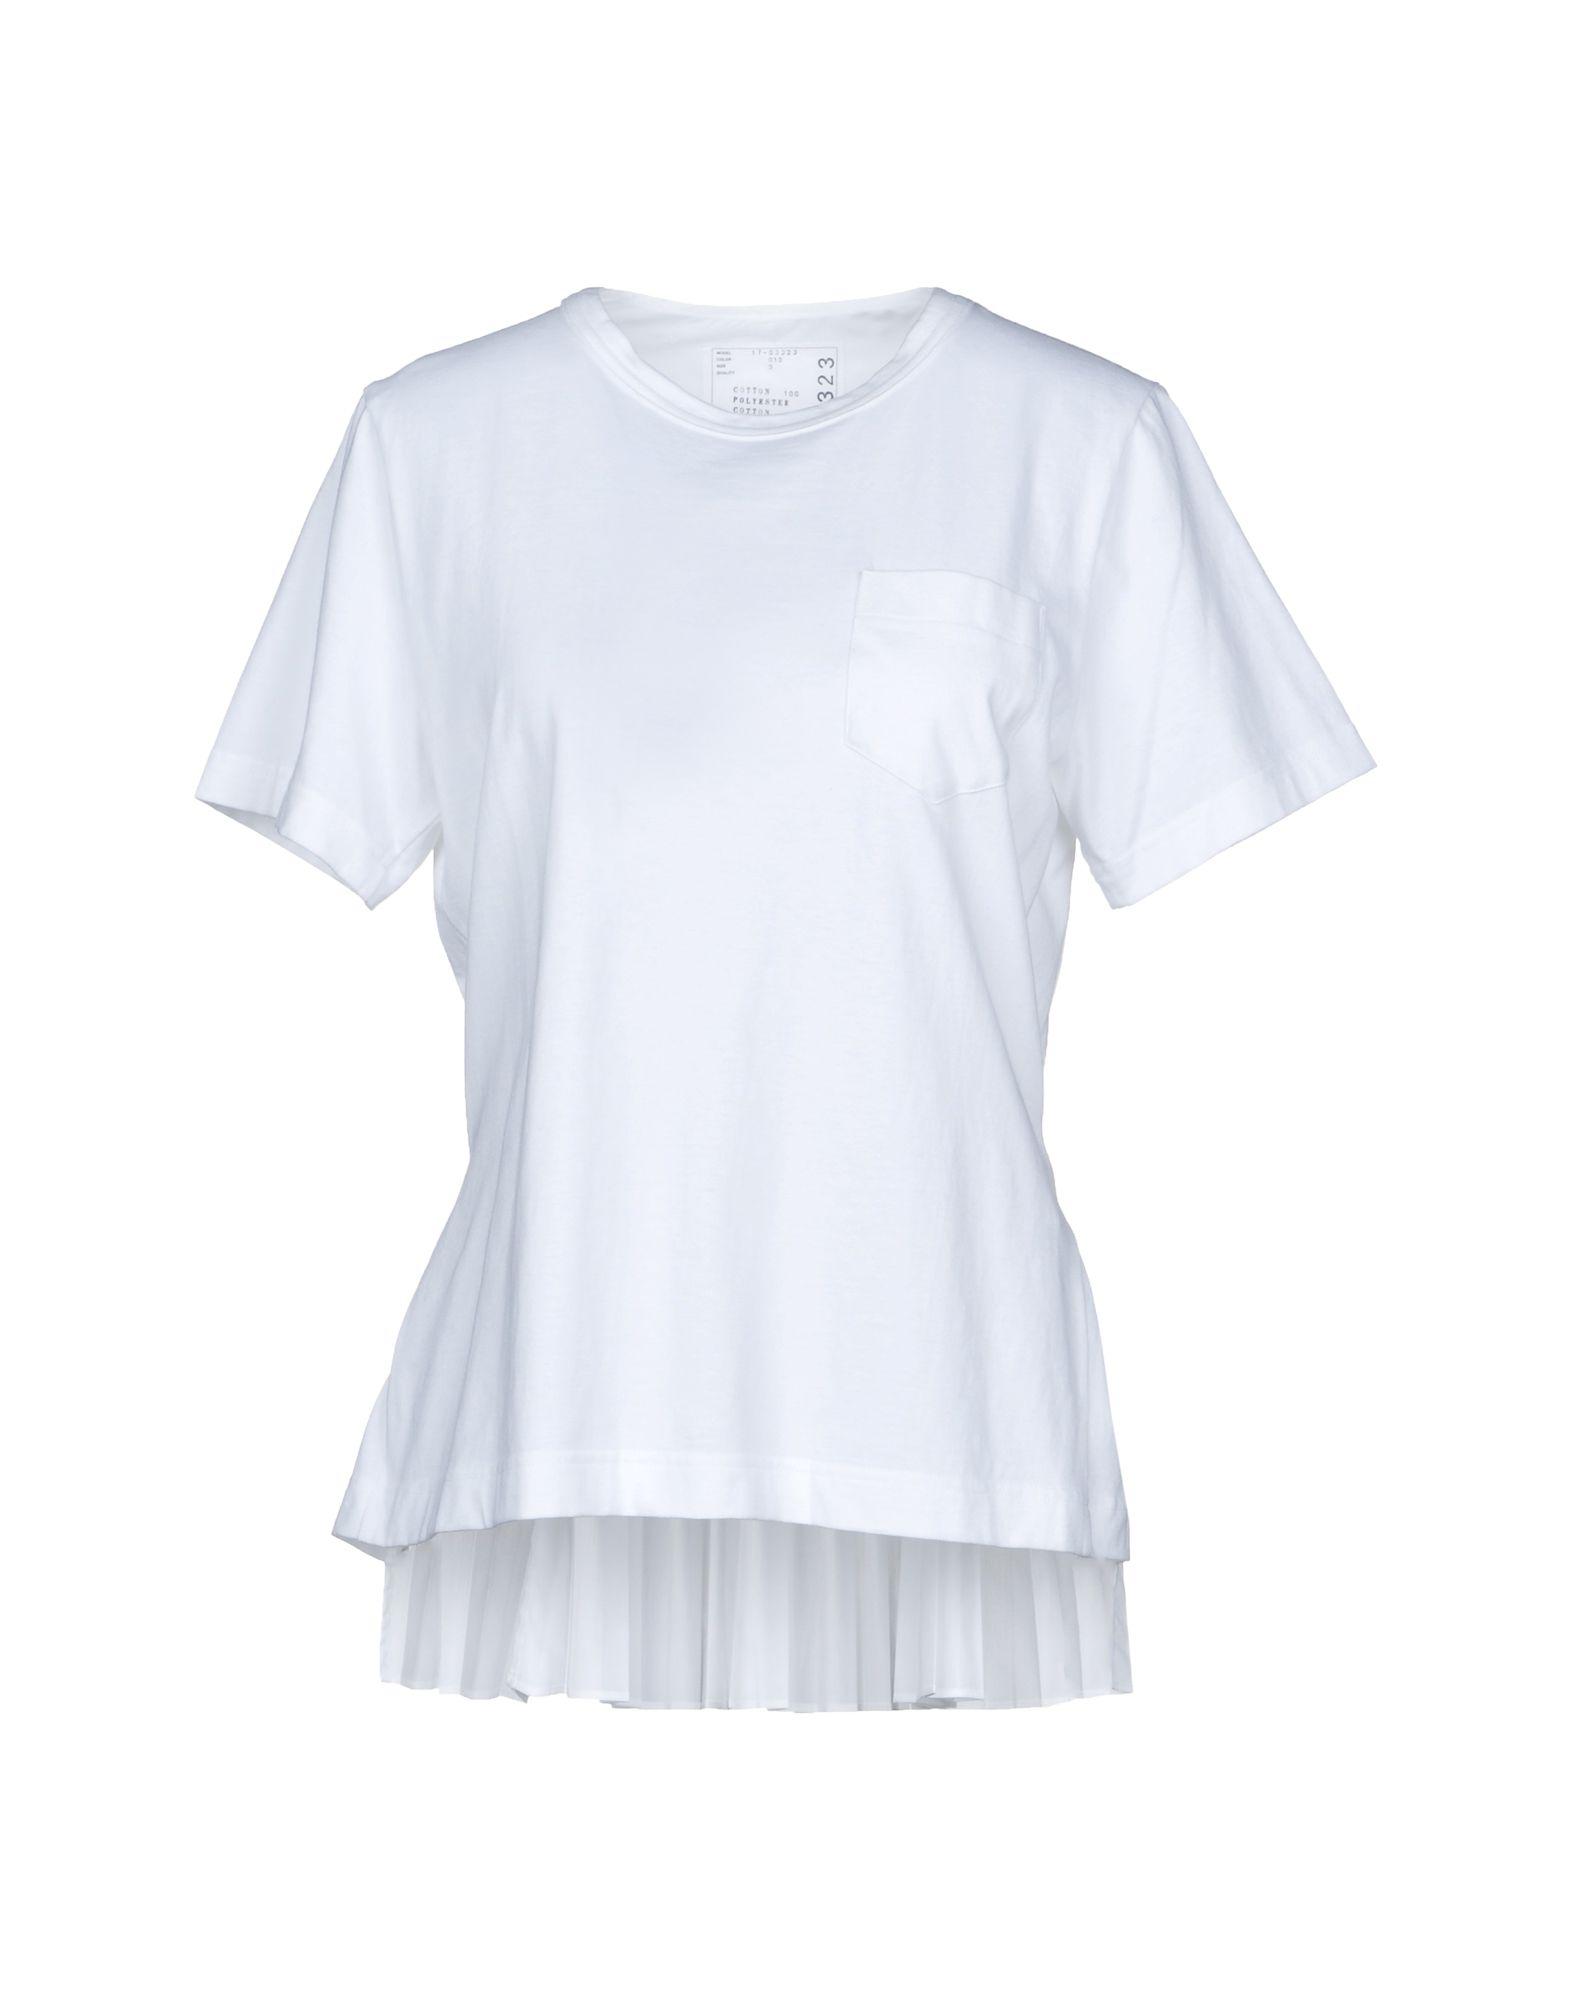 T-Shirt Sacai Donna - Acquista online su dBp4DI7Hgu